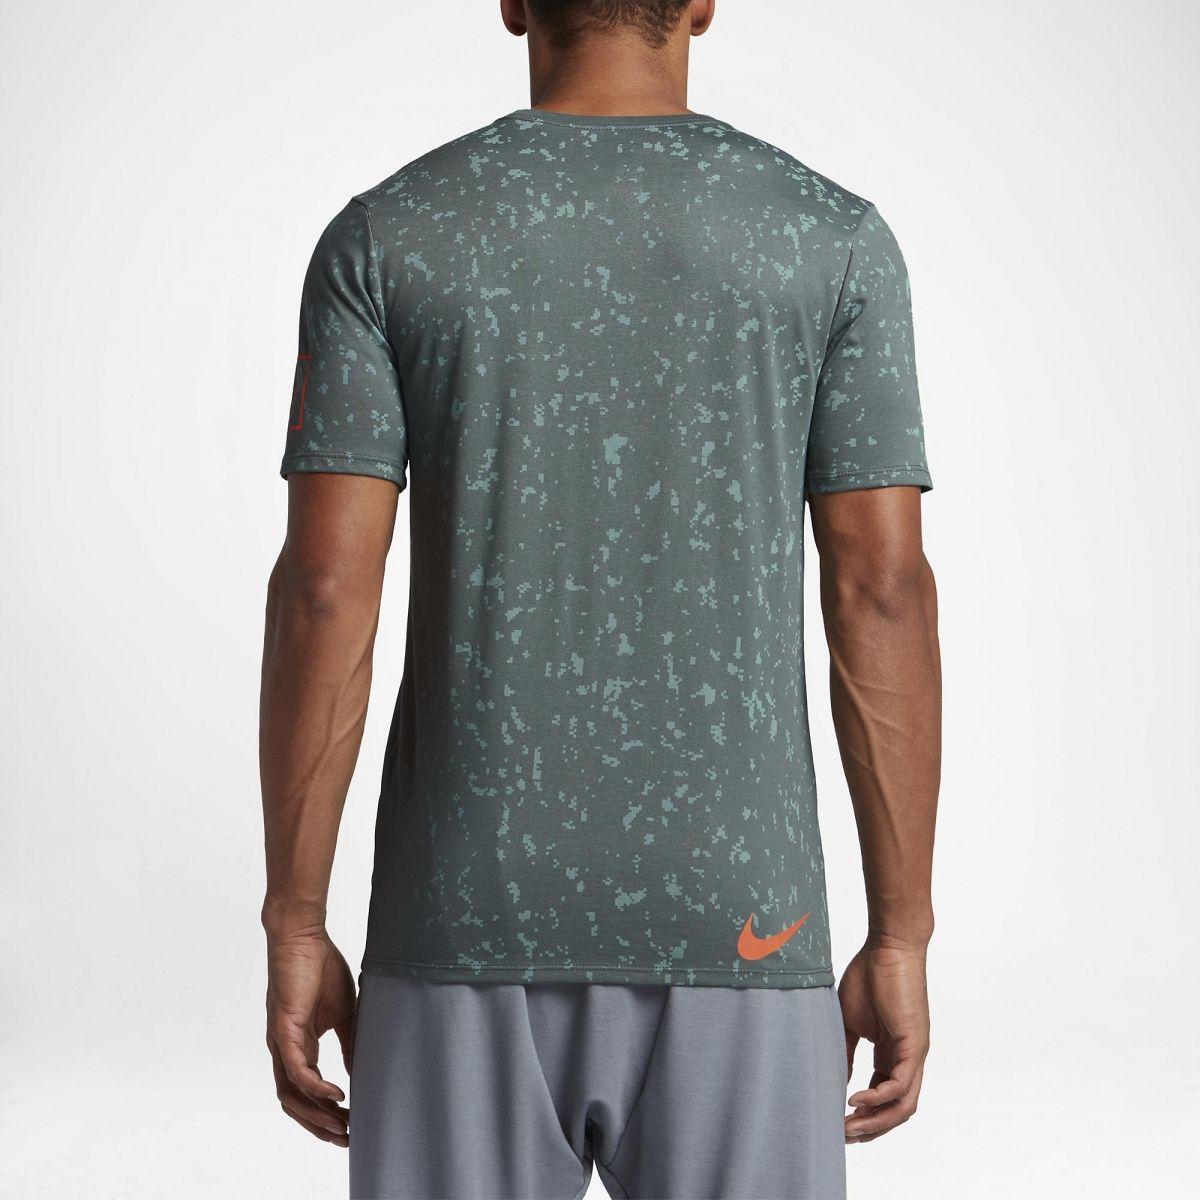 8df413fc764d Type Shirts Nike Cross Dye Bring Your Game Tee